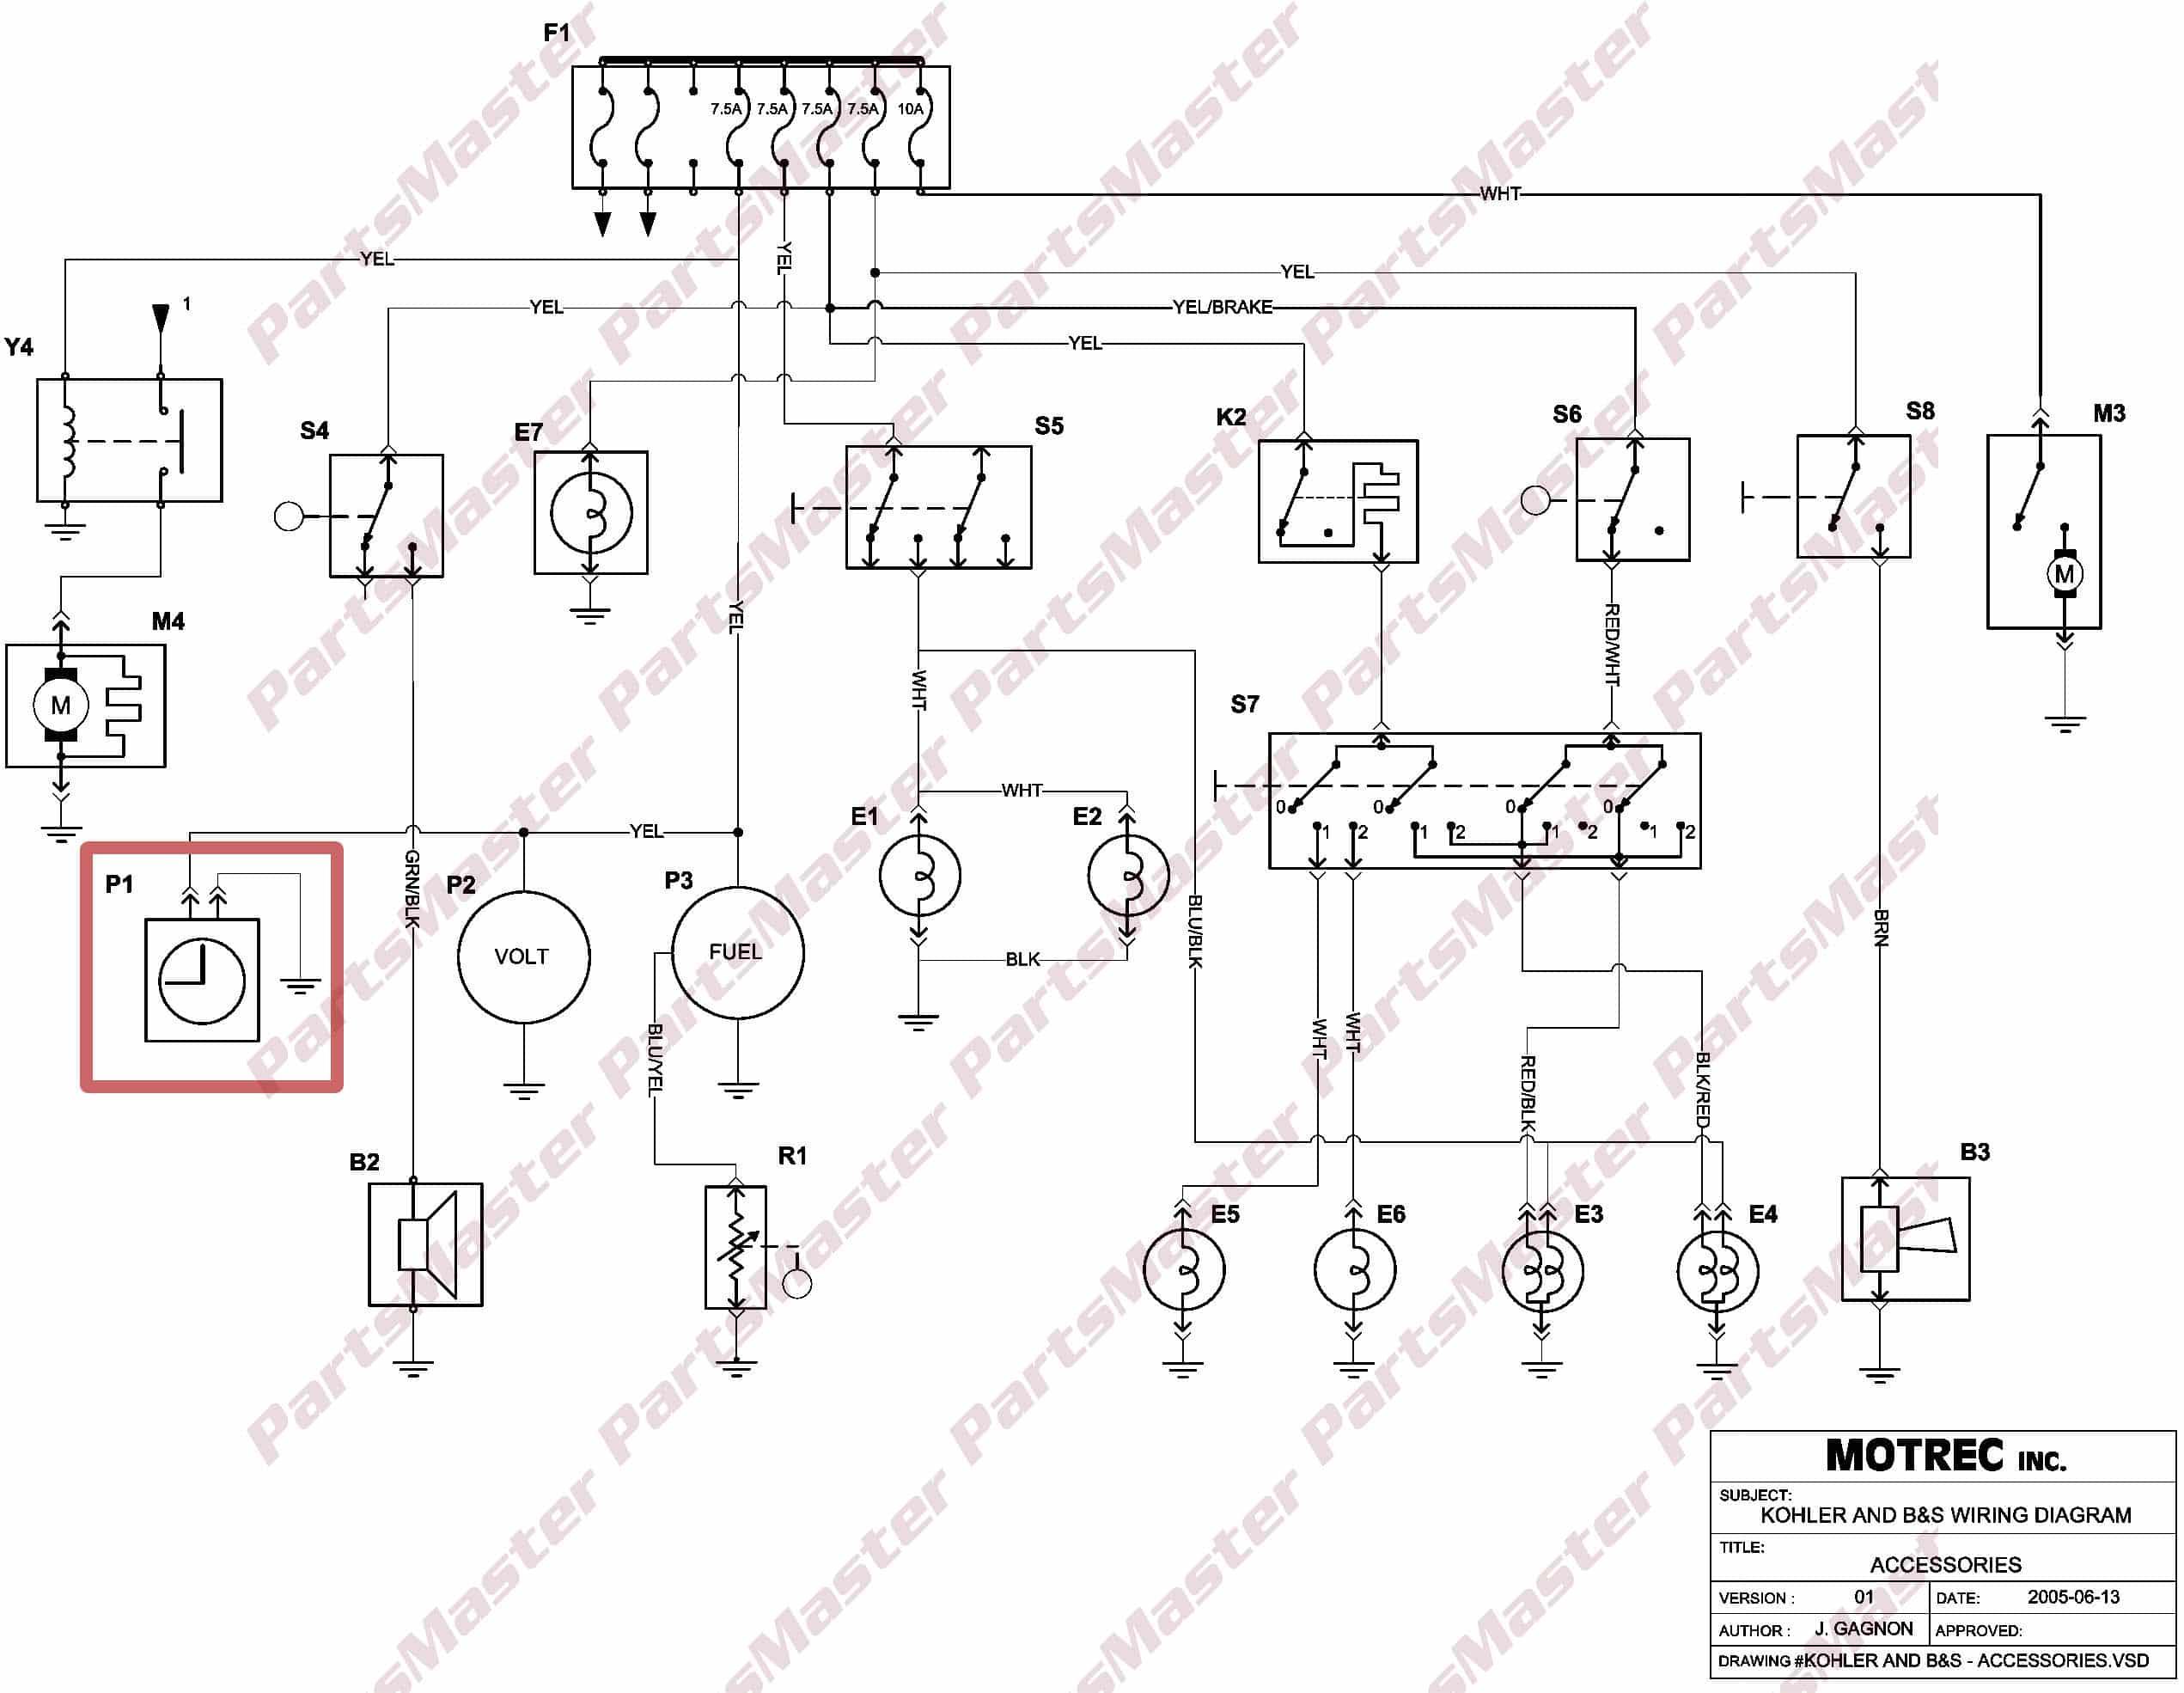 motrec wiring diagram cat wiring diagram wiring library rh seethelaw com Motrec with Movil Pallet Motrec Laundry